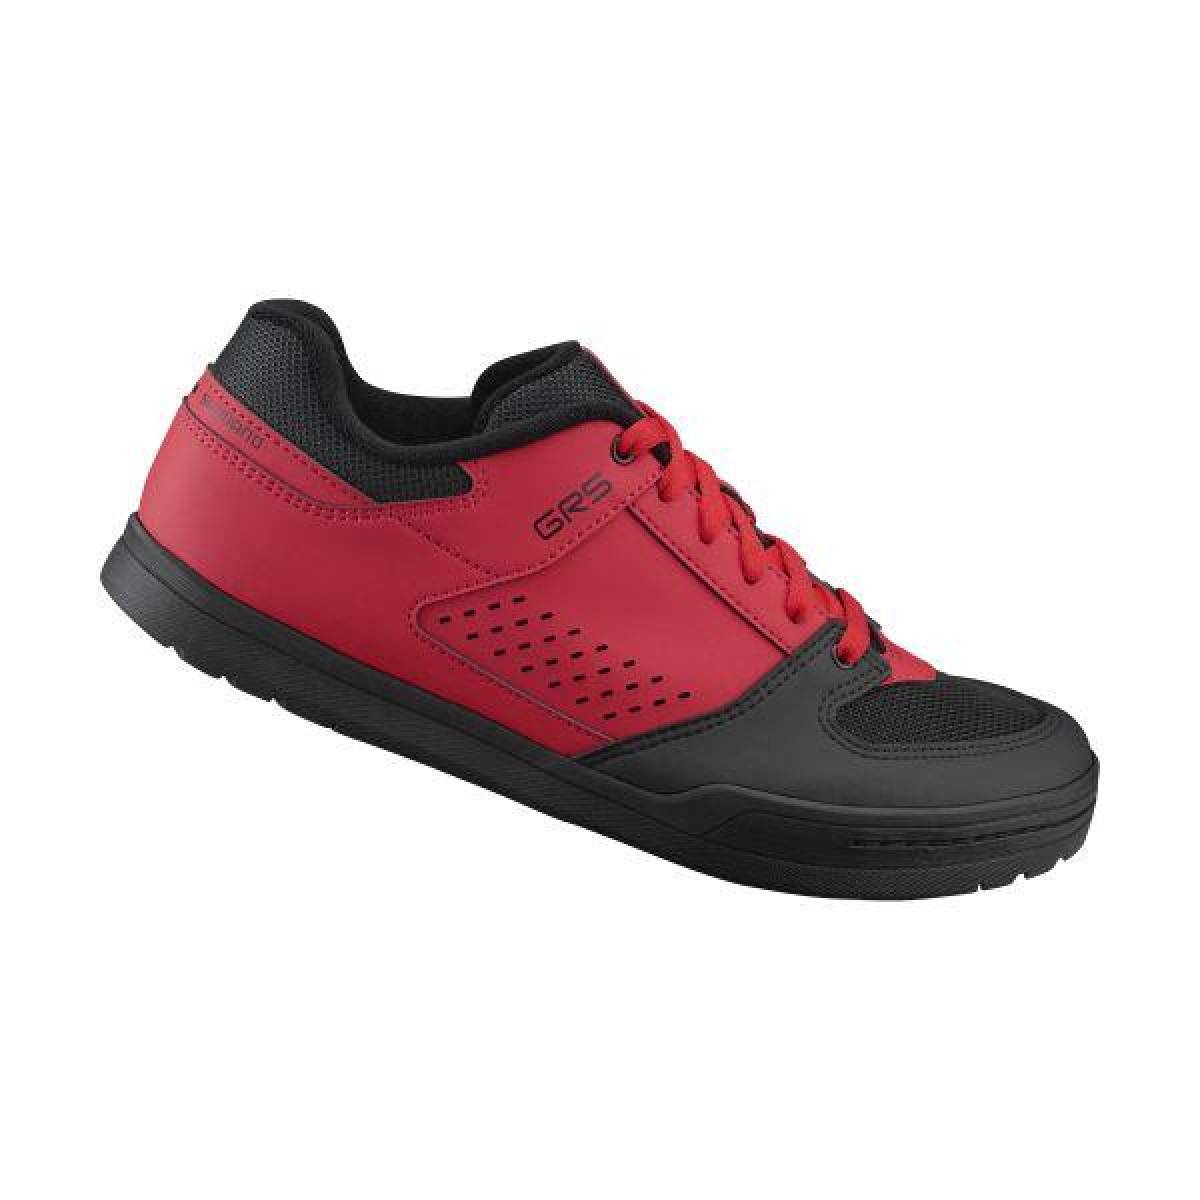 Shimano gravity obuv SH-GR500MR, červená, 40